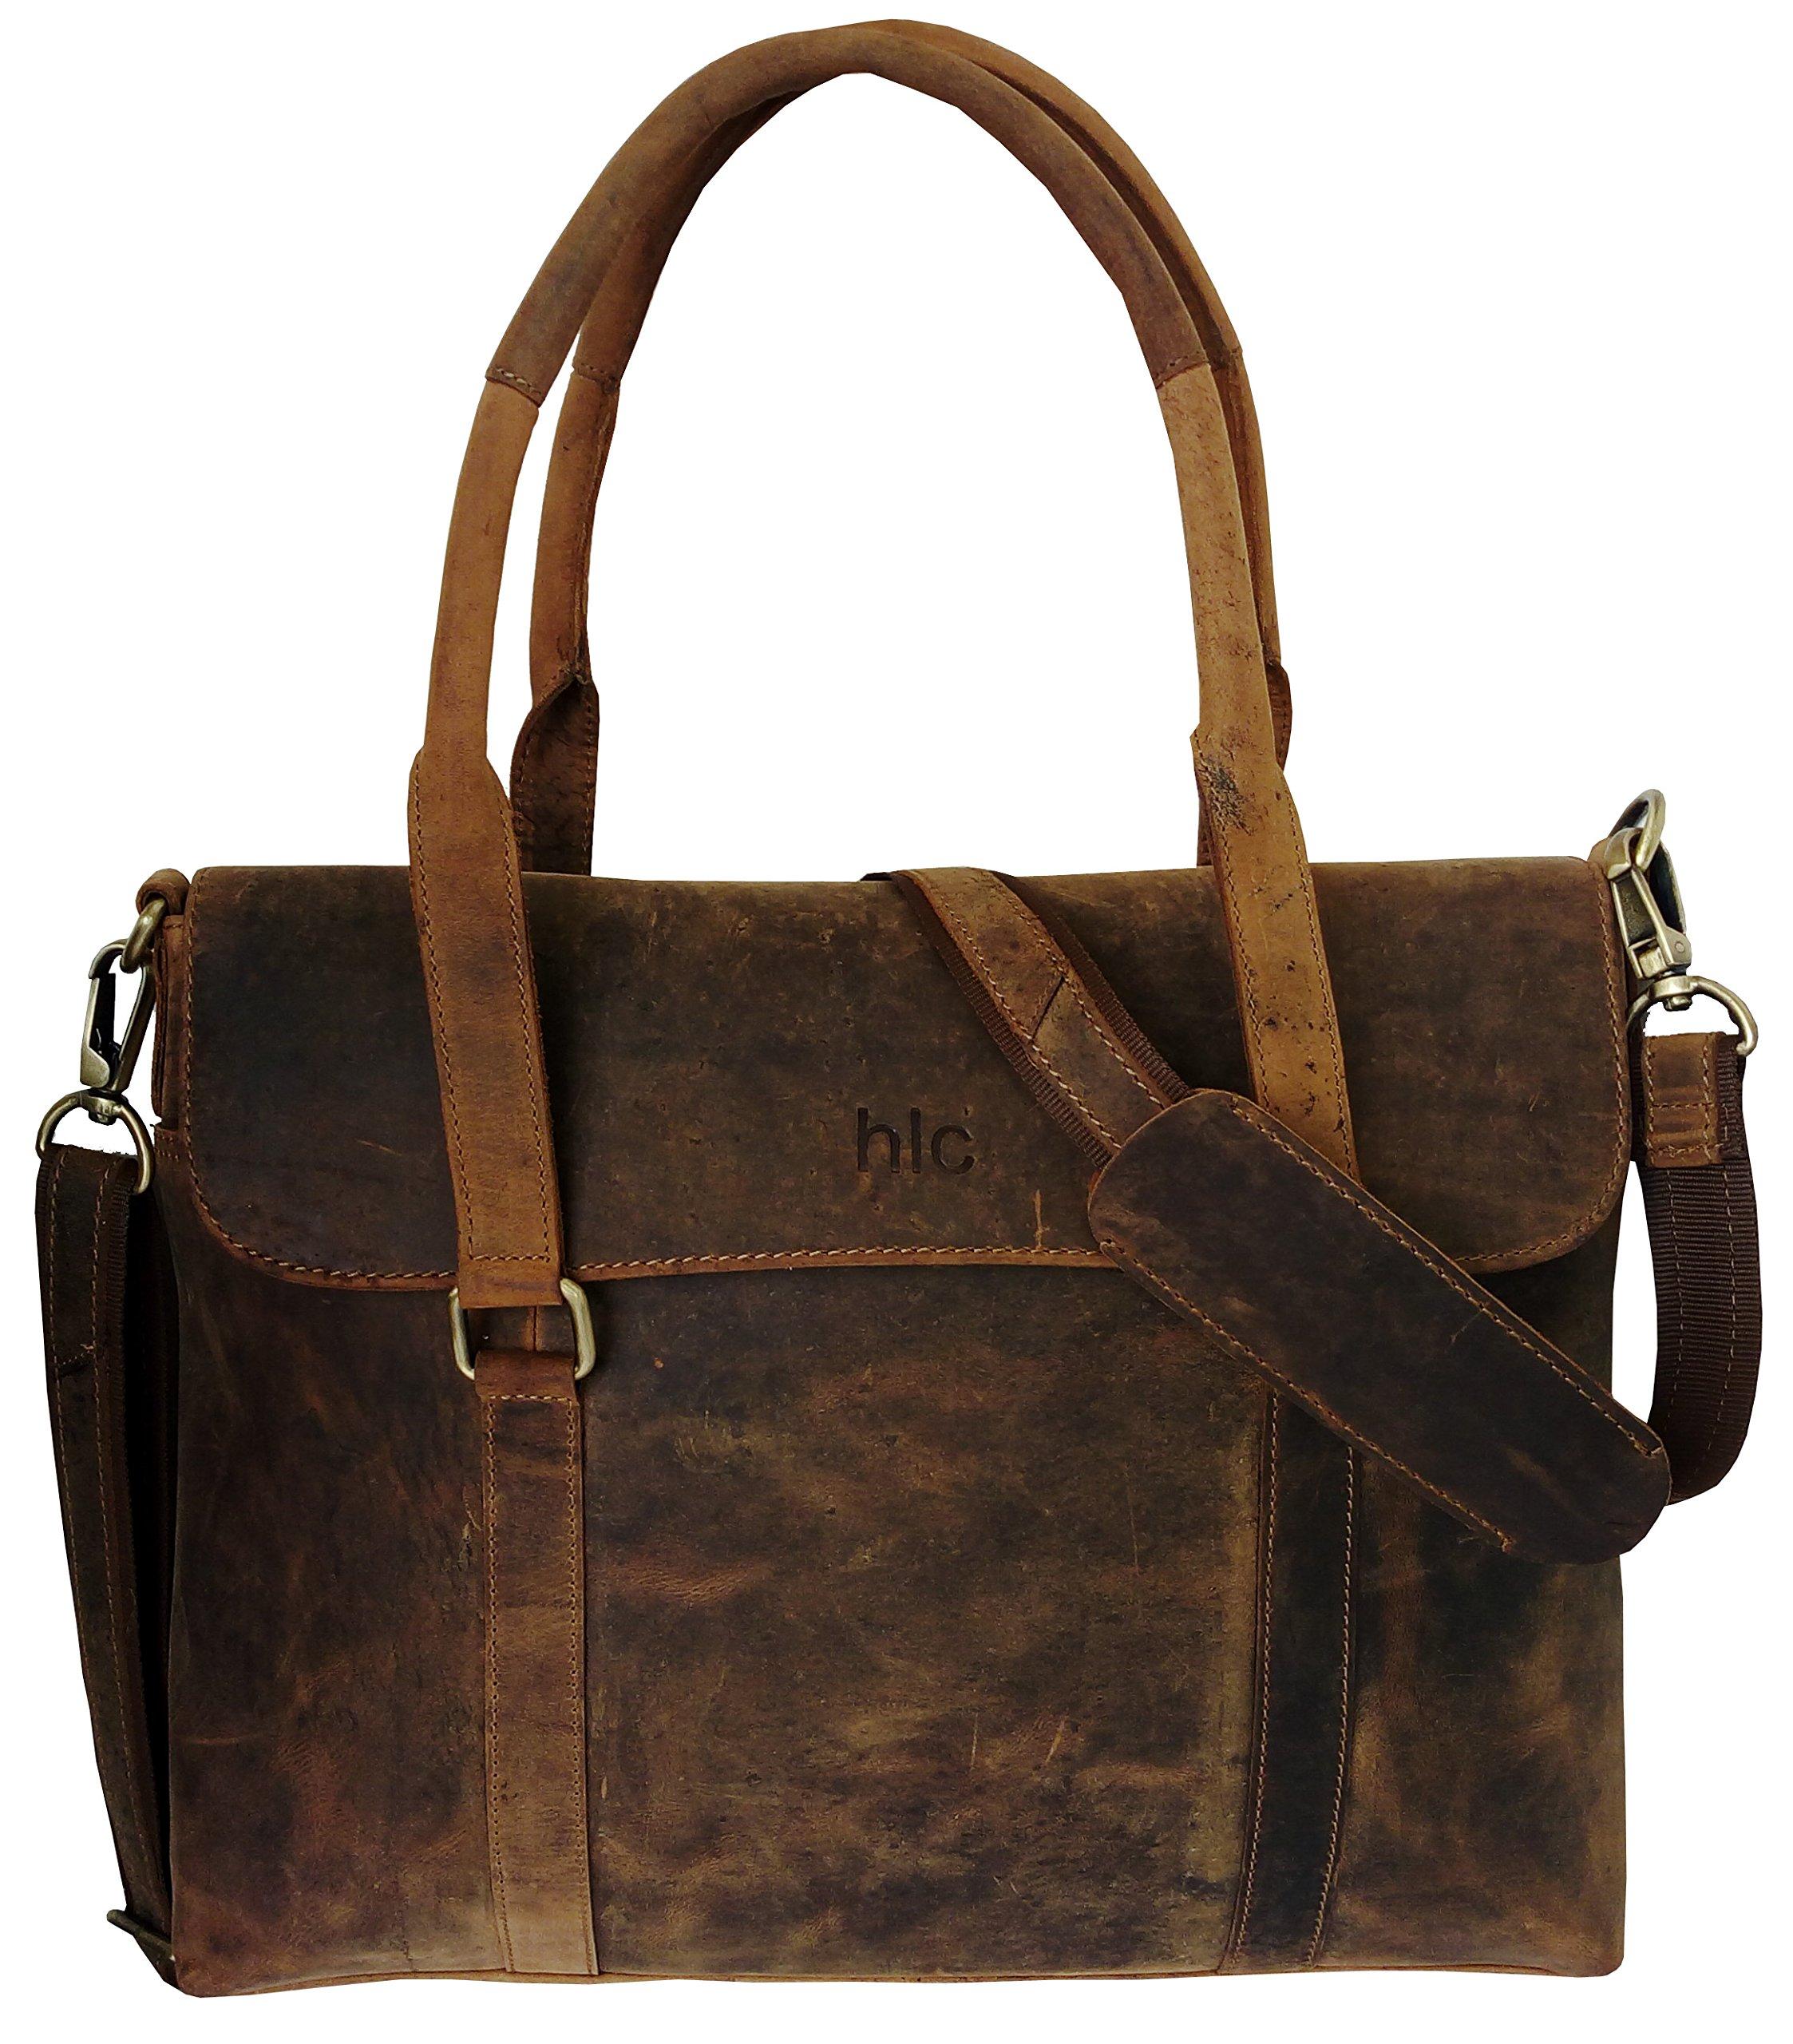 HLC Buffalo Leather Messenger Handmade Bag Laptop Bag Satchel Bag Padded Messenger Bag School Bag 16X12X4 Inches Brown